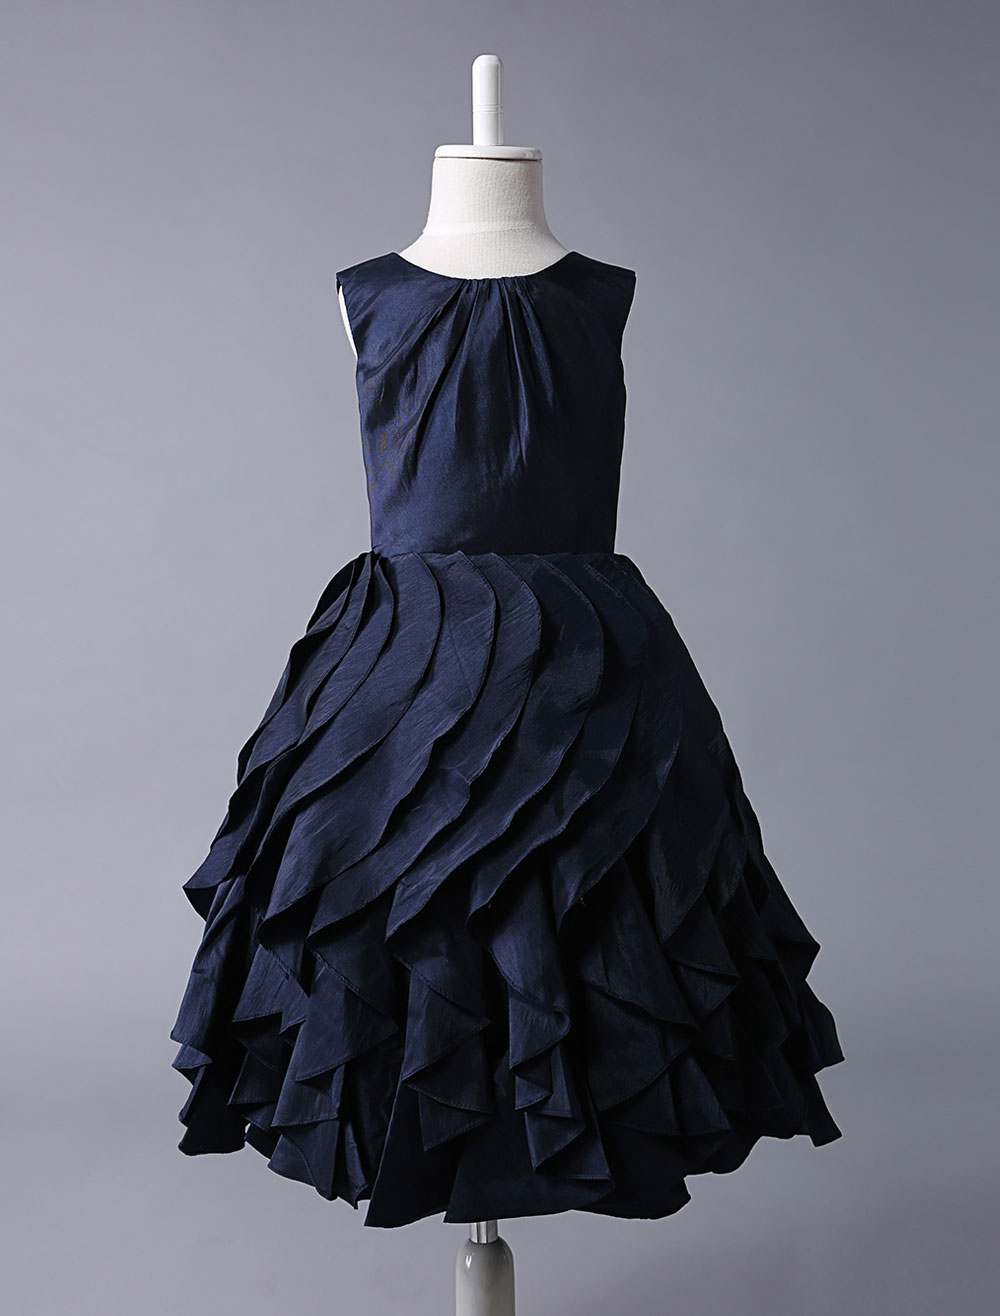 Navy Blue Taffeta Flower Girl Dress With Ruffle Skirt